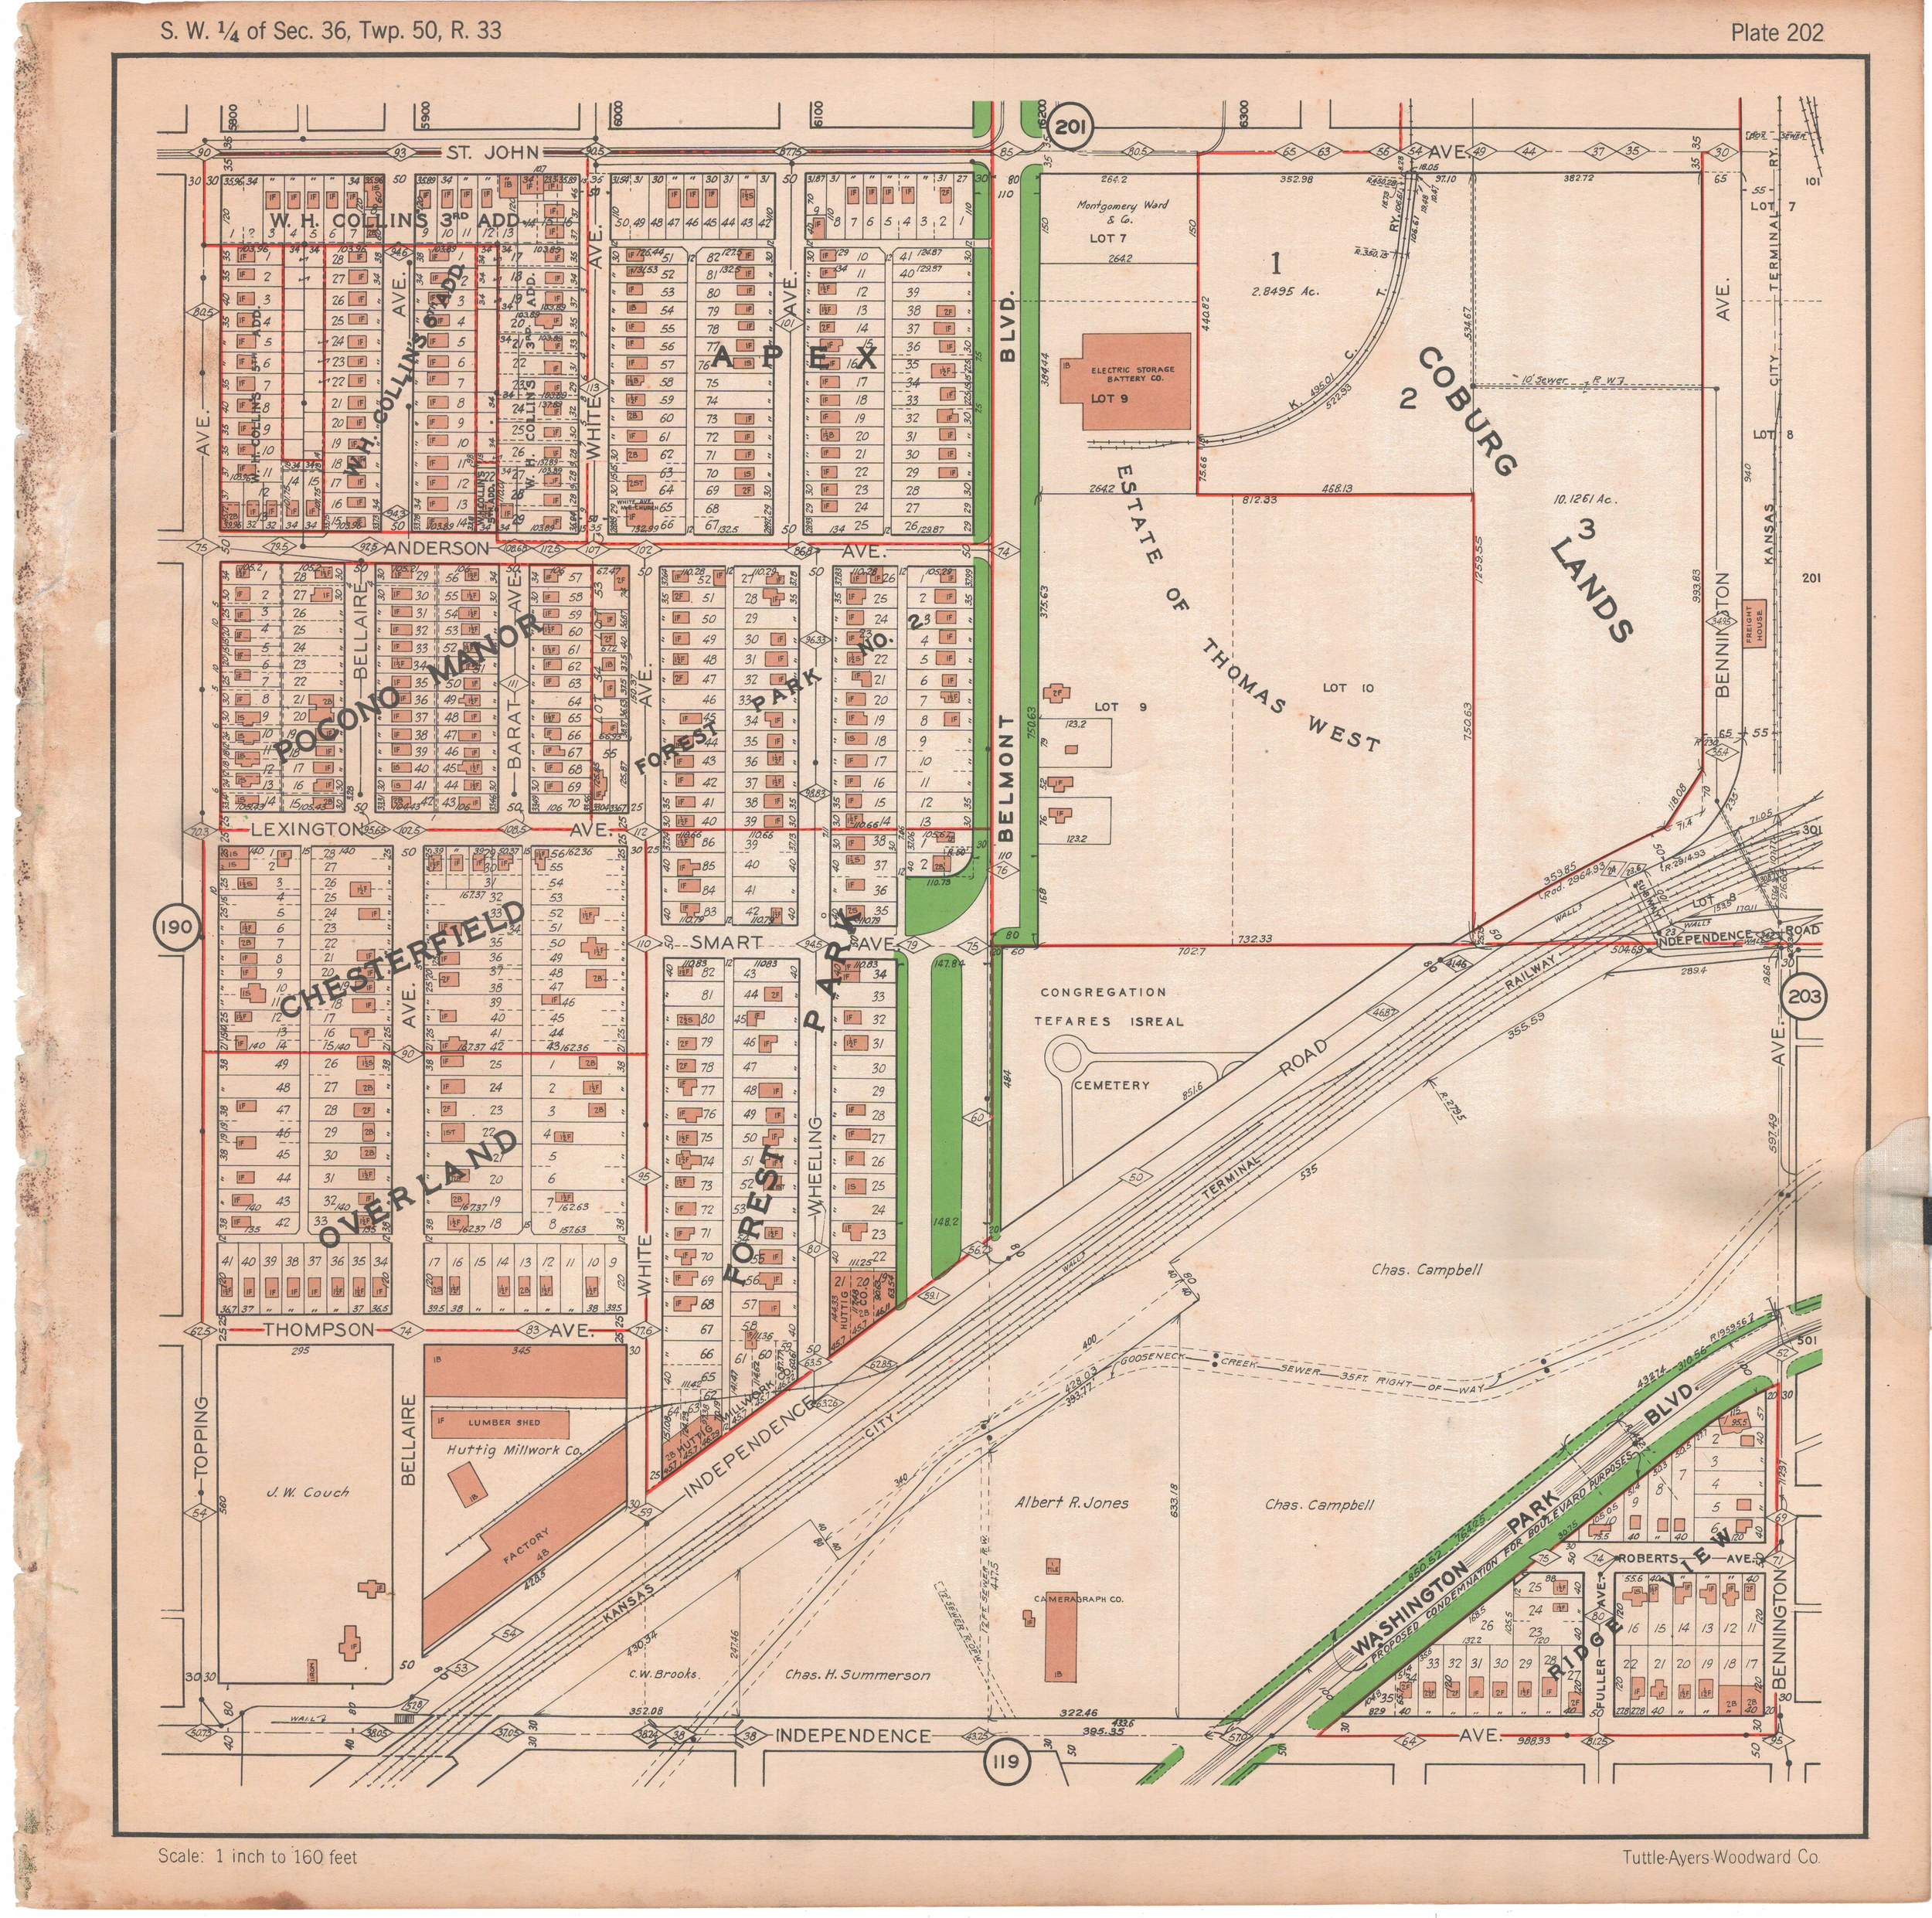 1925 TUTTLE_AYERS_Plate_202.JPG